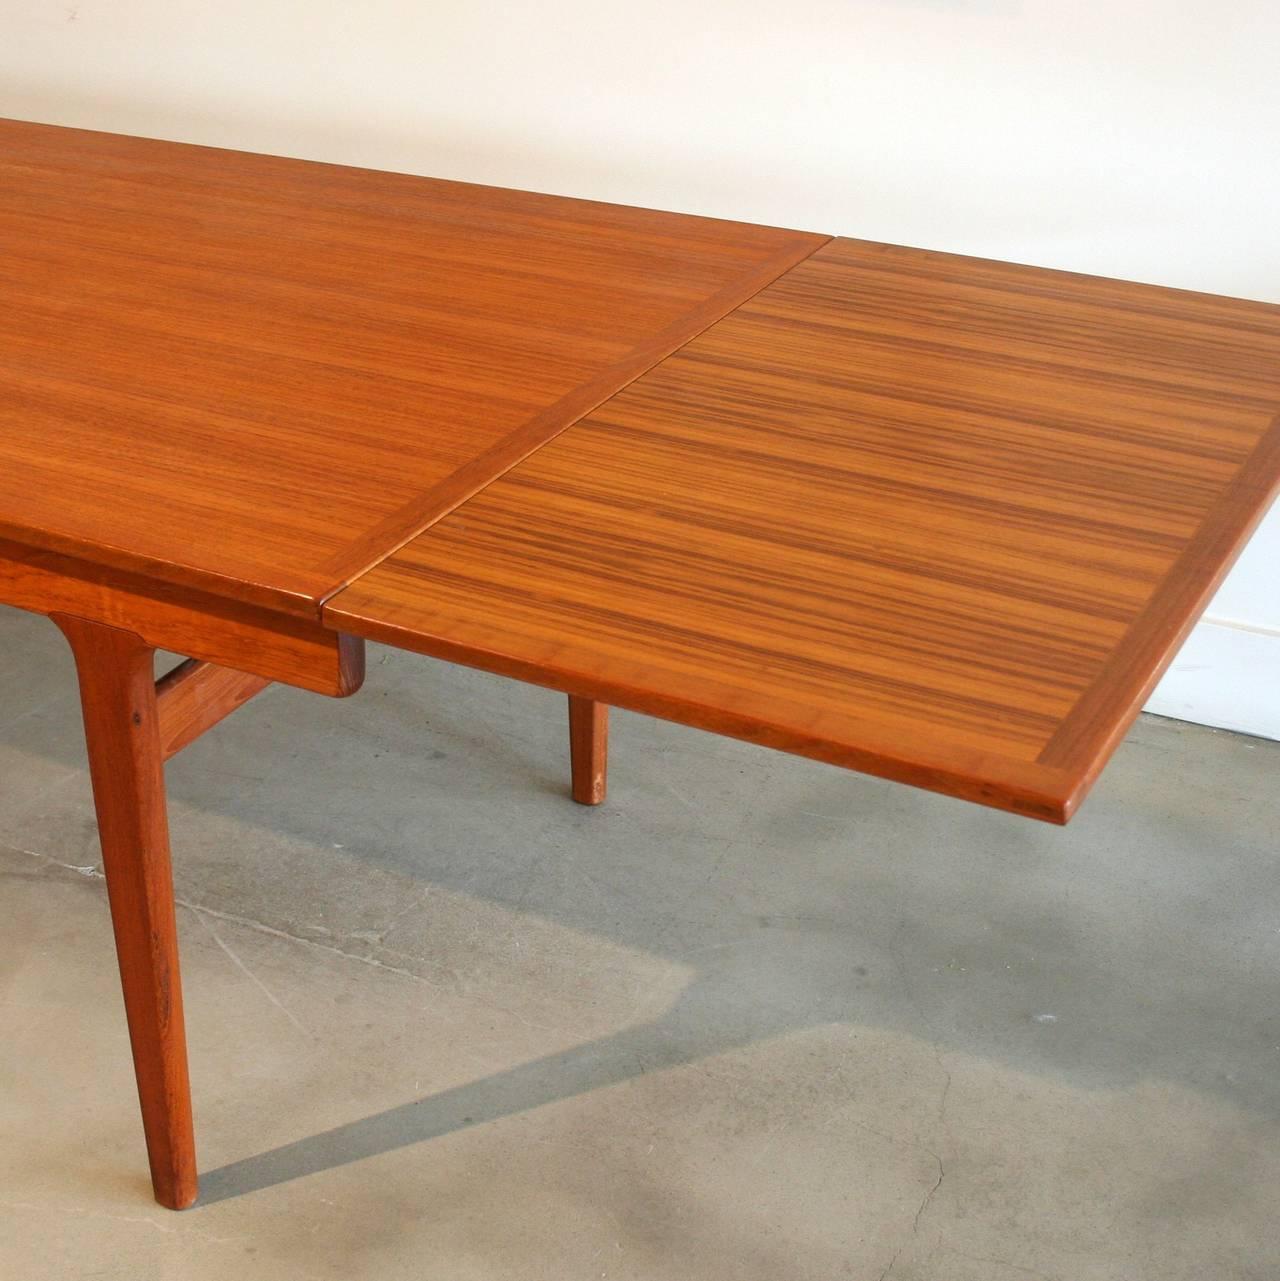 Vintage Danish Teak DIning Table at 1stdibs : IMG6622l from www.1stdibs.com size 1280 x 1281 jpeg 141kB